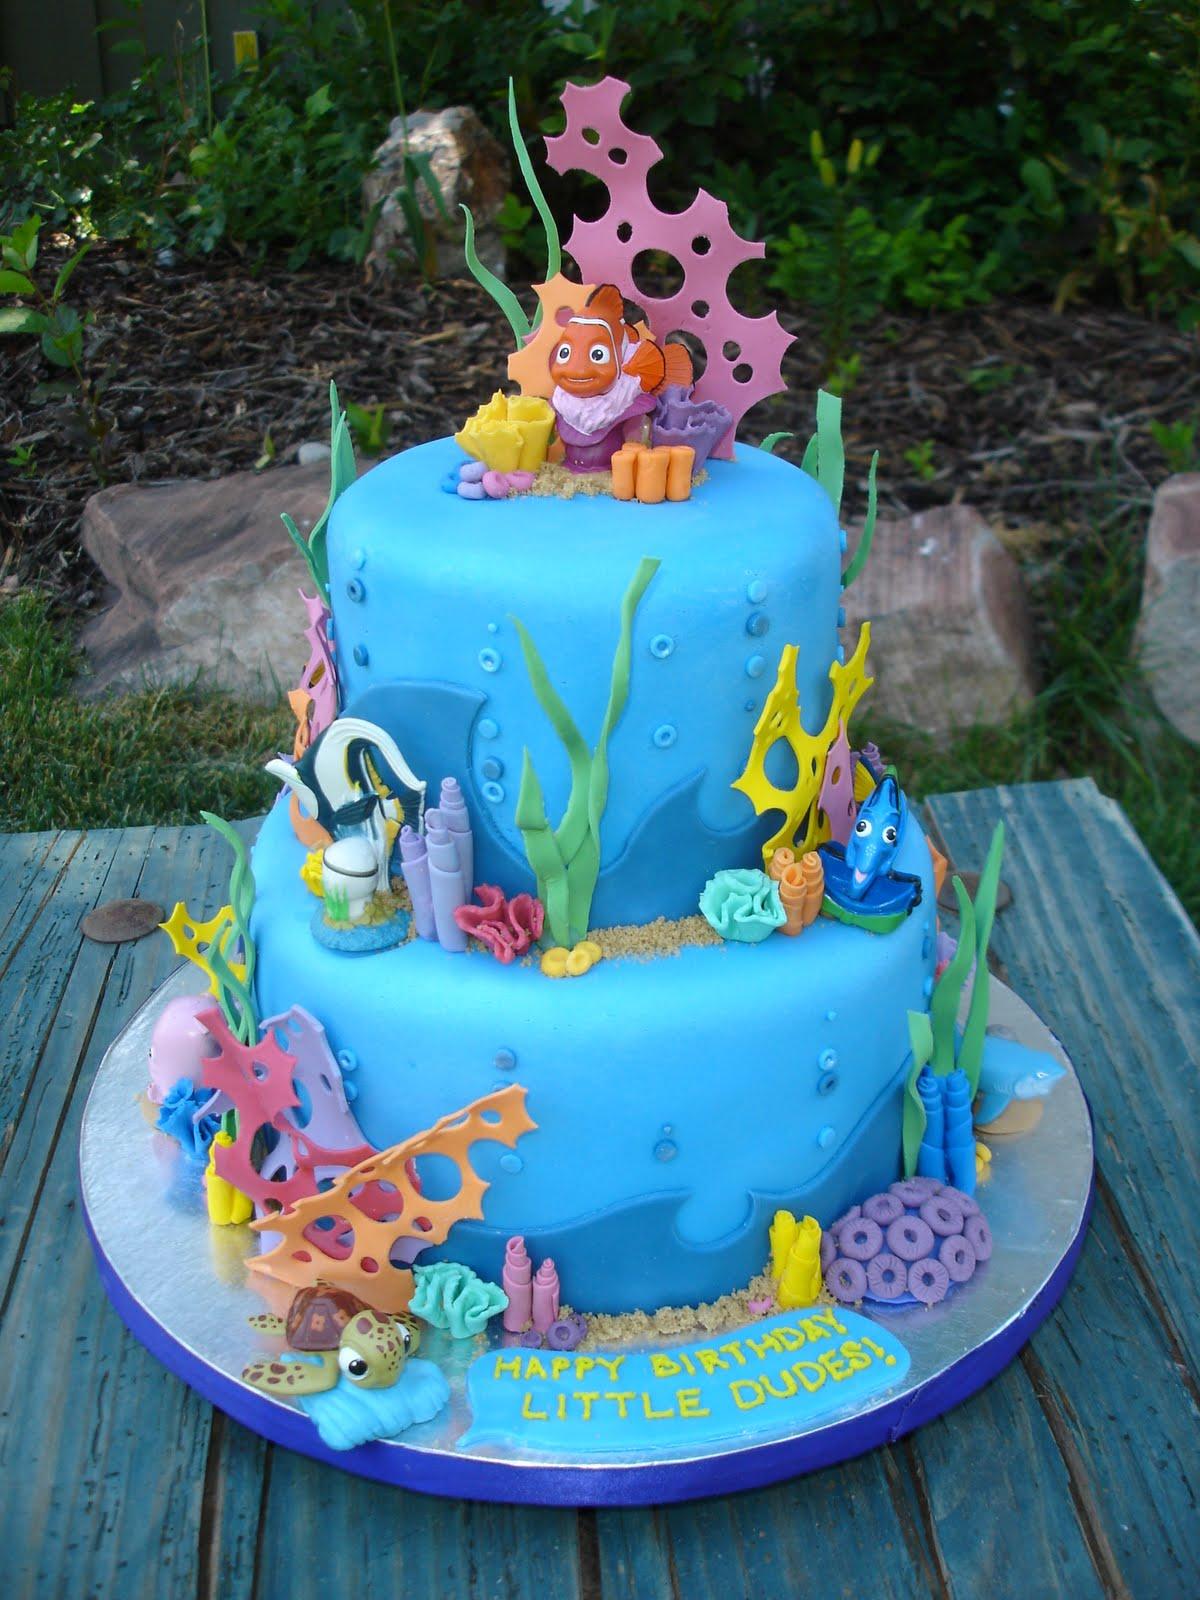 Cake Design Nemo : Image Birthday Cake Finding Nemo Or Ladybug Is Download